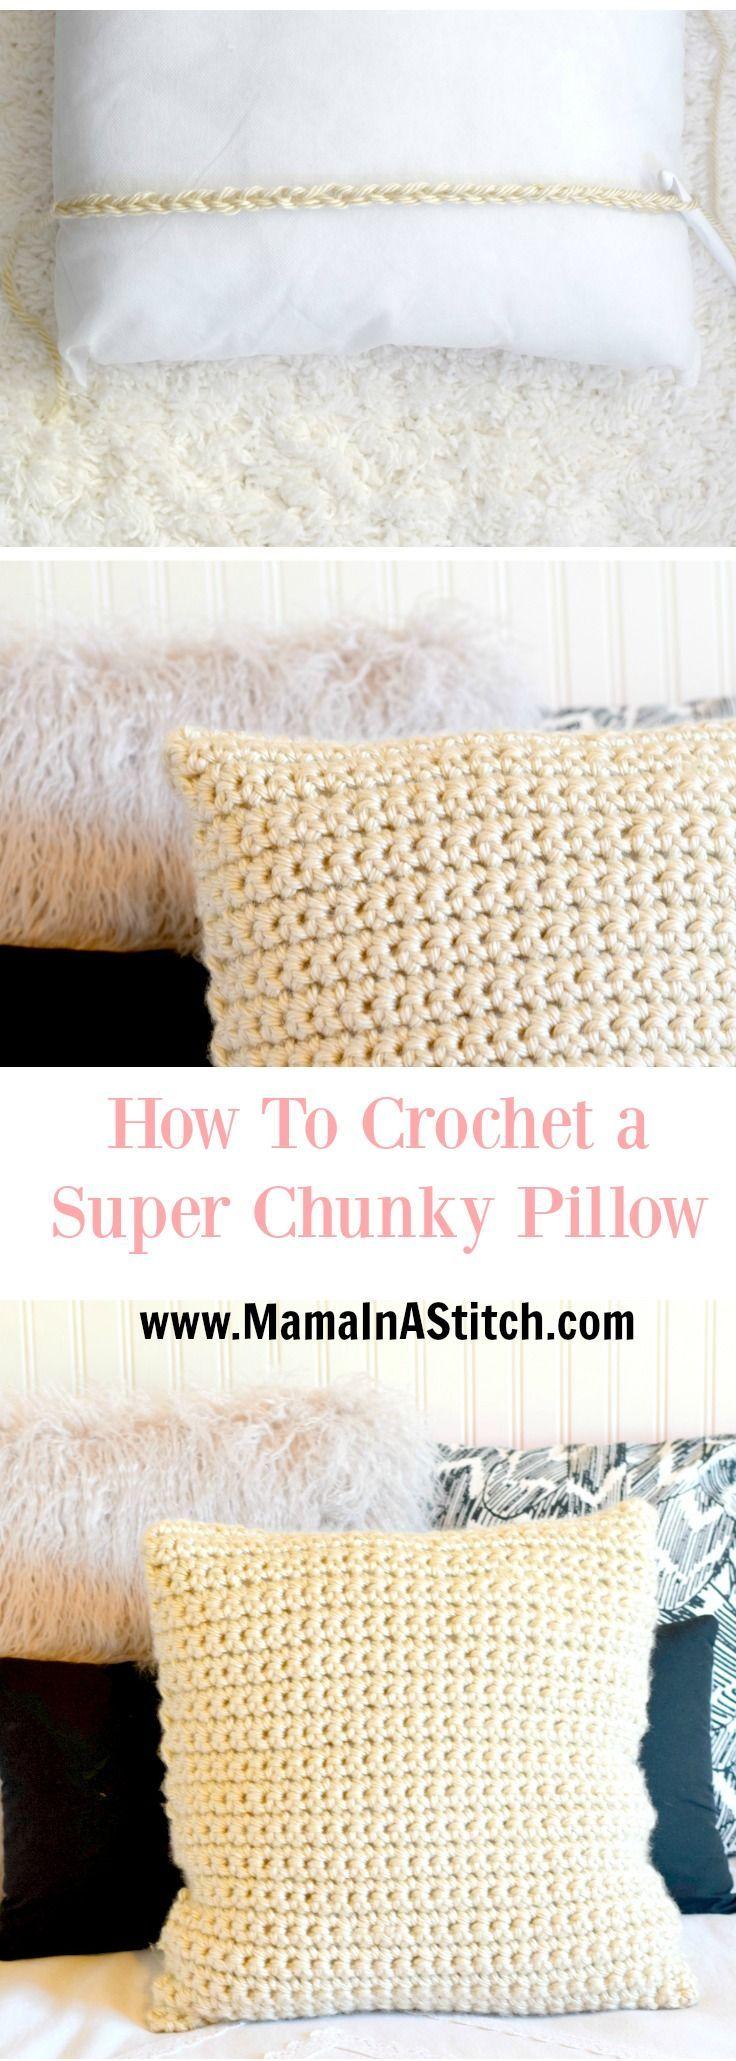 Super Chunky Crochet Pillow Project via @MamaInAStitch | Crochet ...